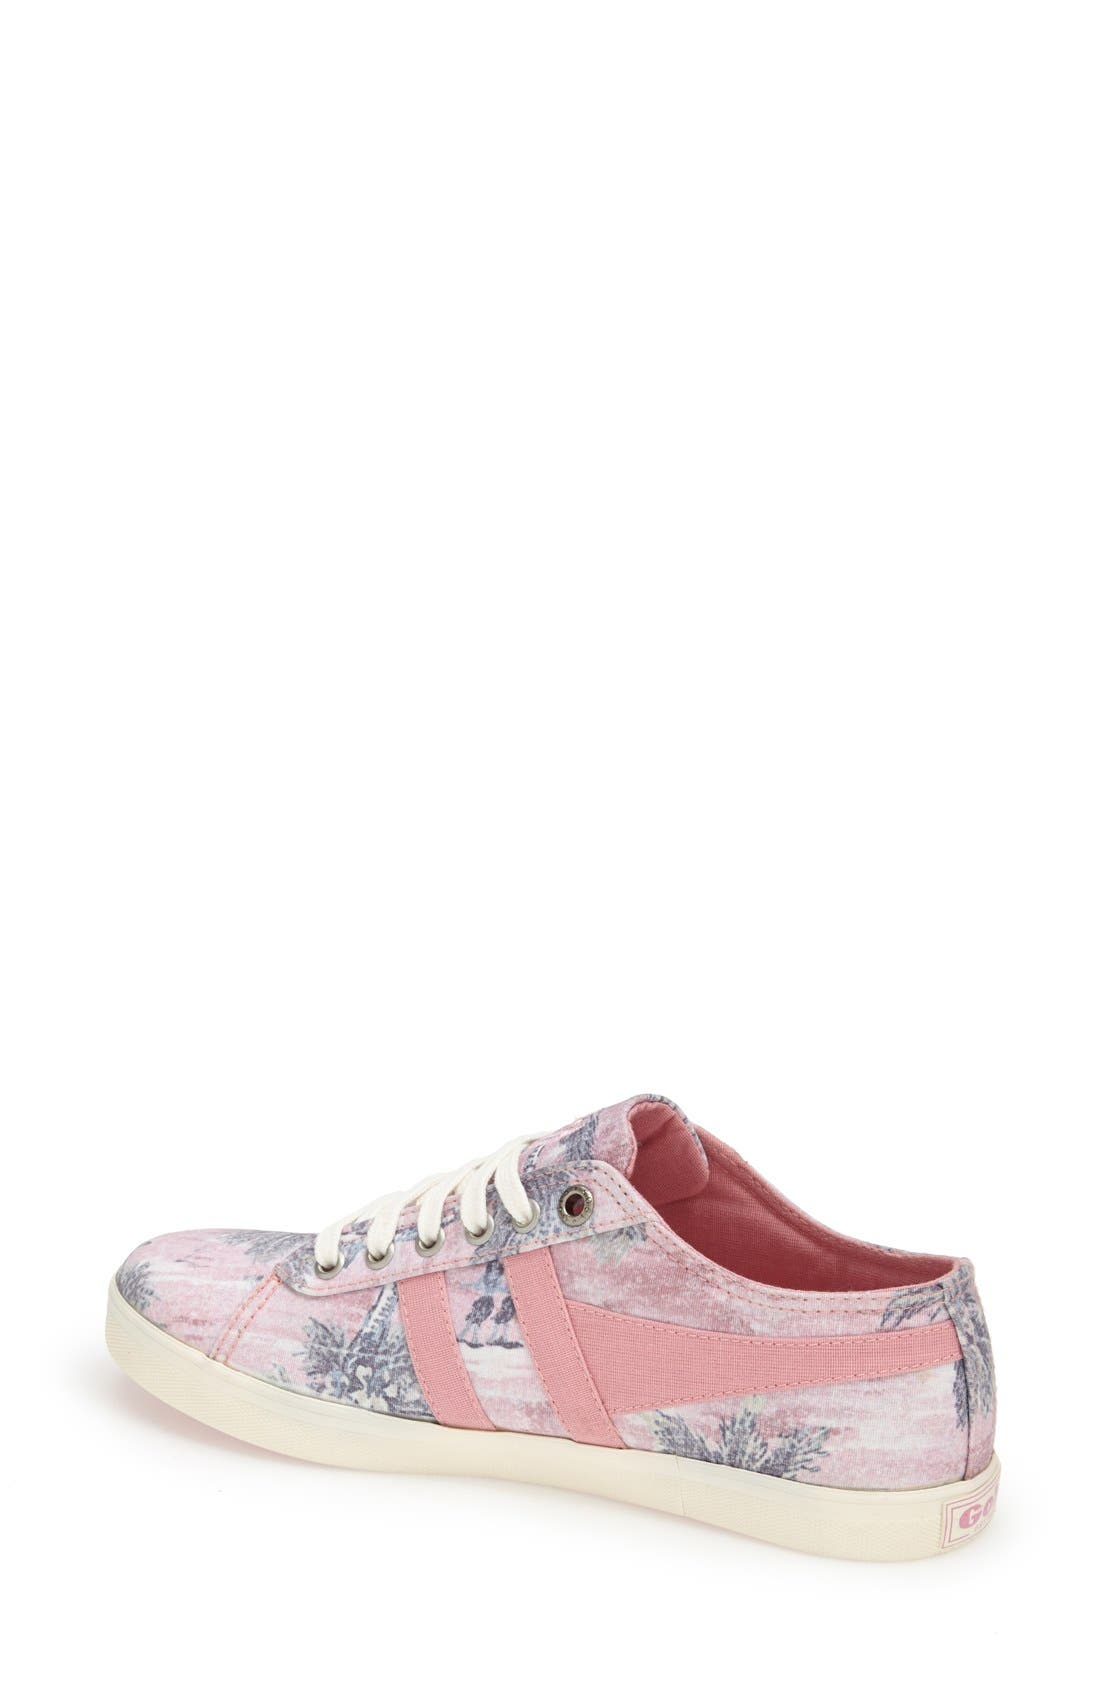 'Jasmine Aloha' Sneaker,                             Alternate thumbnail 2, color,                             650